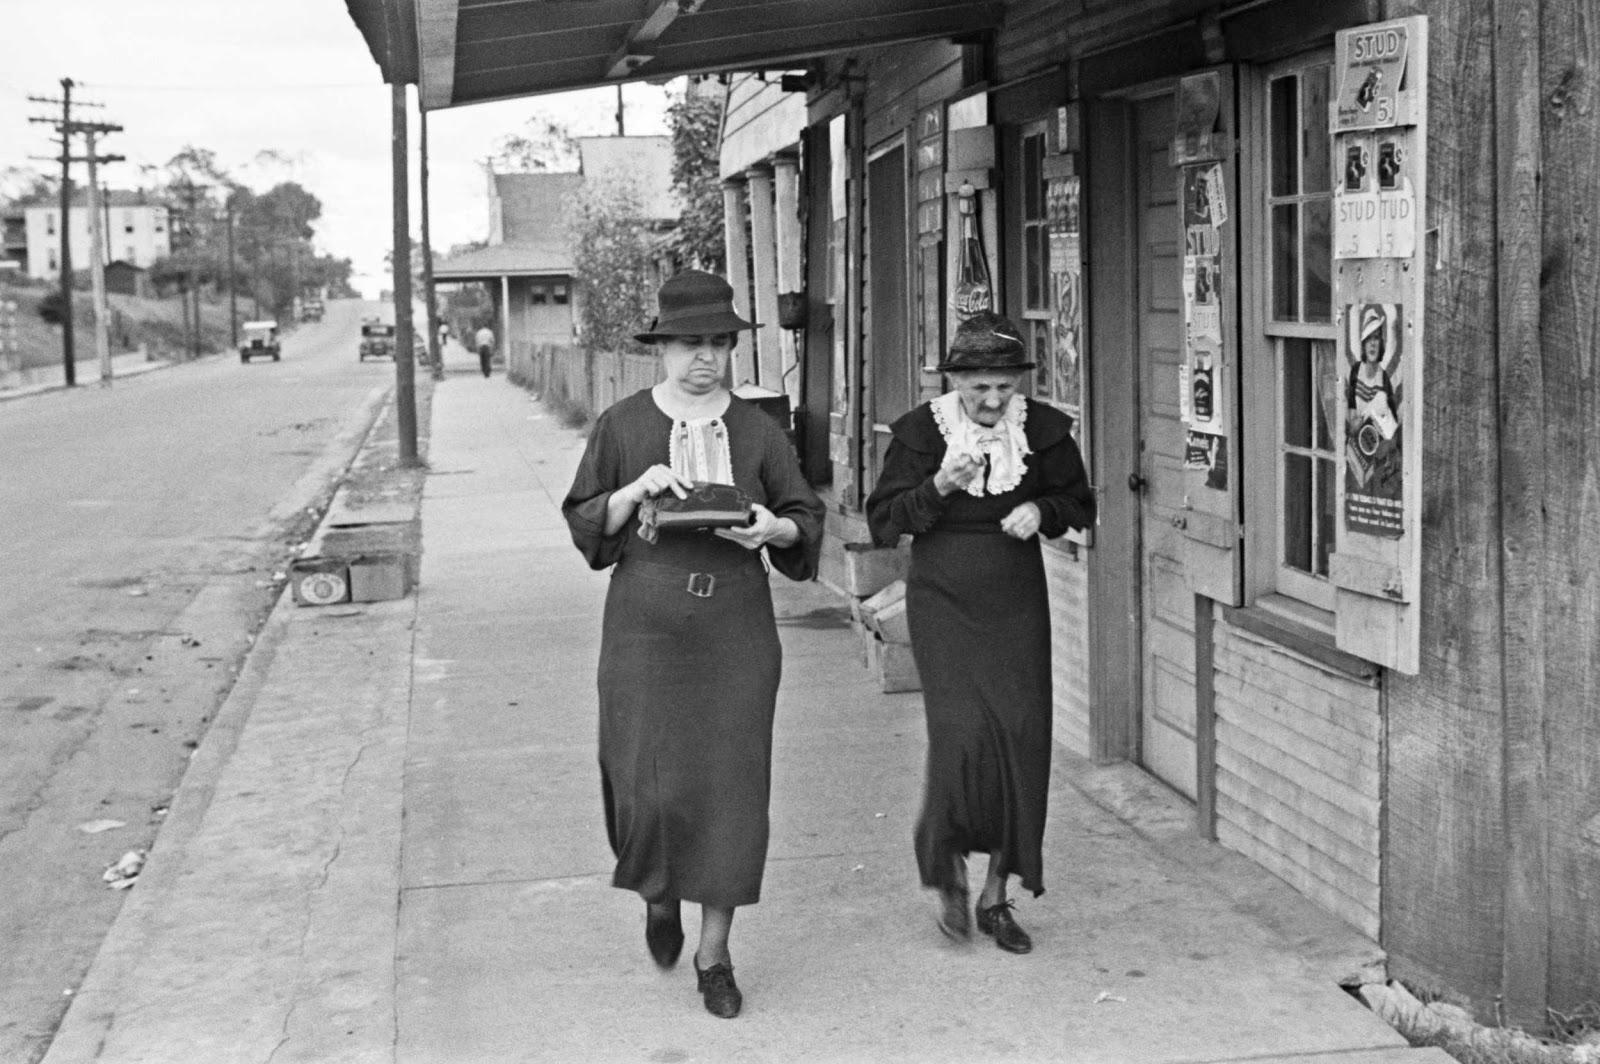 maynardville women 2018-7-17 - knoxville, tn - local news, regional news, national news, international news, breaking news, consumer news, health news, morning news, political news.